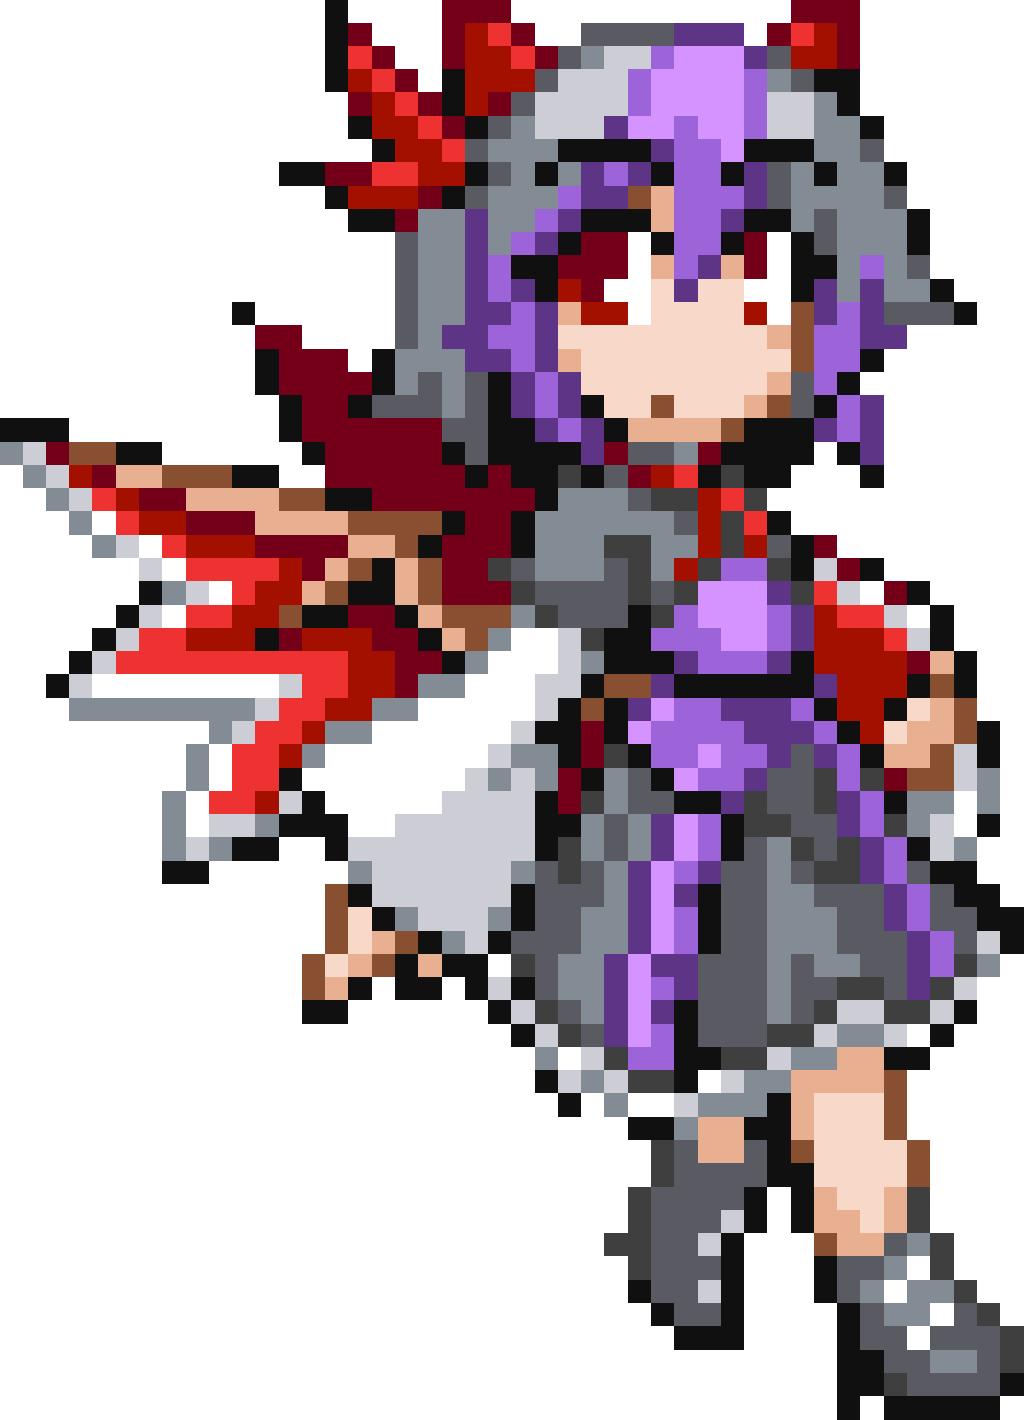 Pixelart Draw Anime Manga Colorbynumber Game Ninjapixel Pixel Art Anime Pixel Art Art Apps